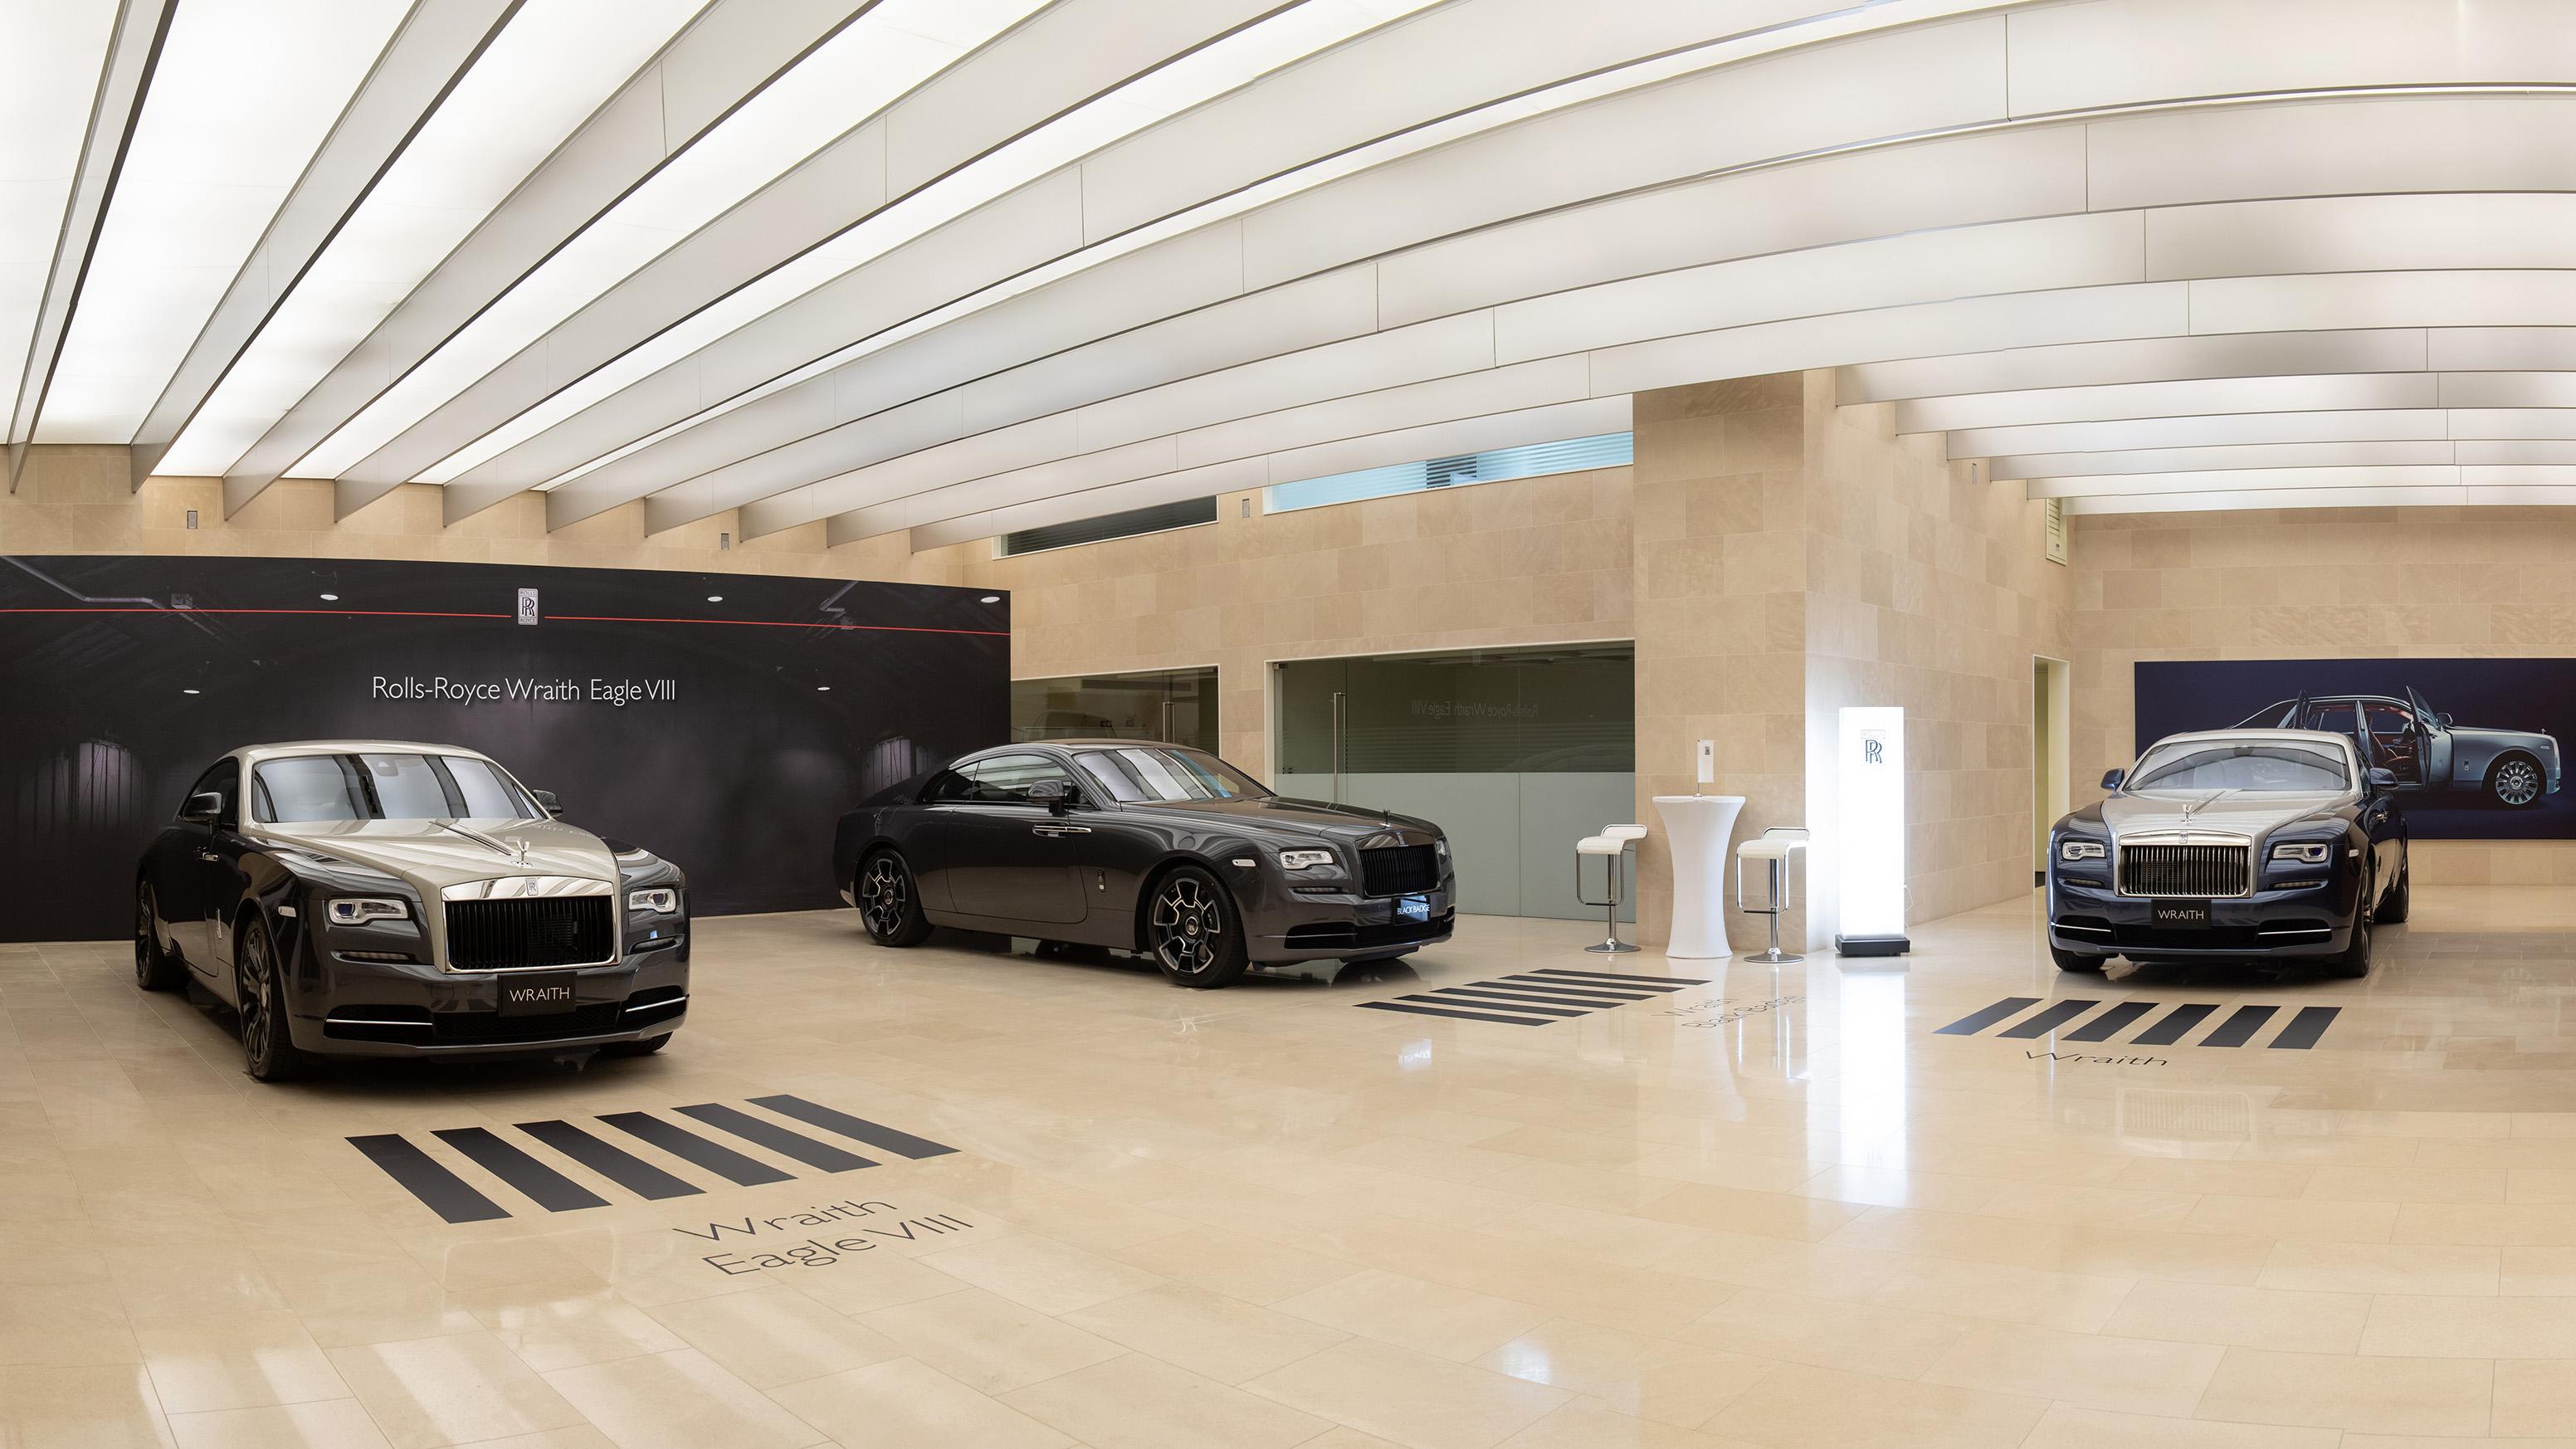 Rolls-Royce Wraith Eagle VIII 飛鷹八號登台,台灣限量 1 部已完售